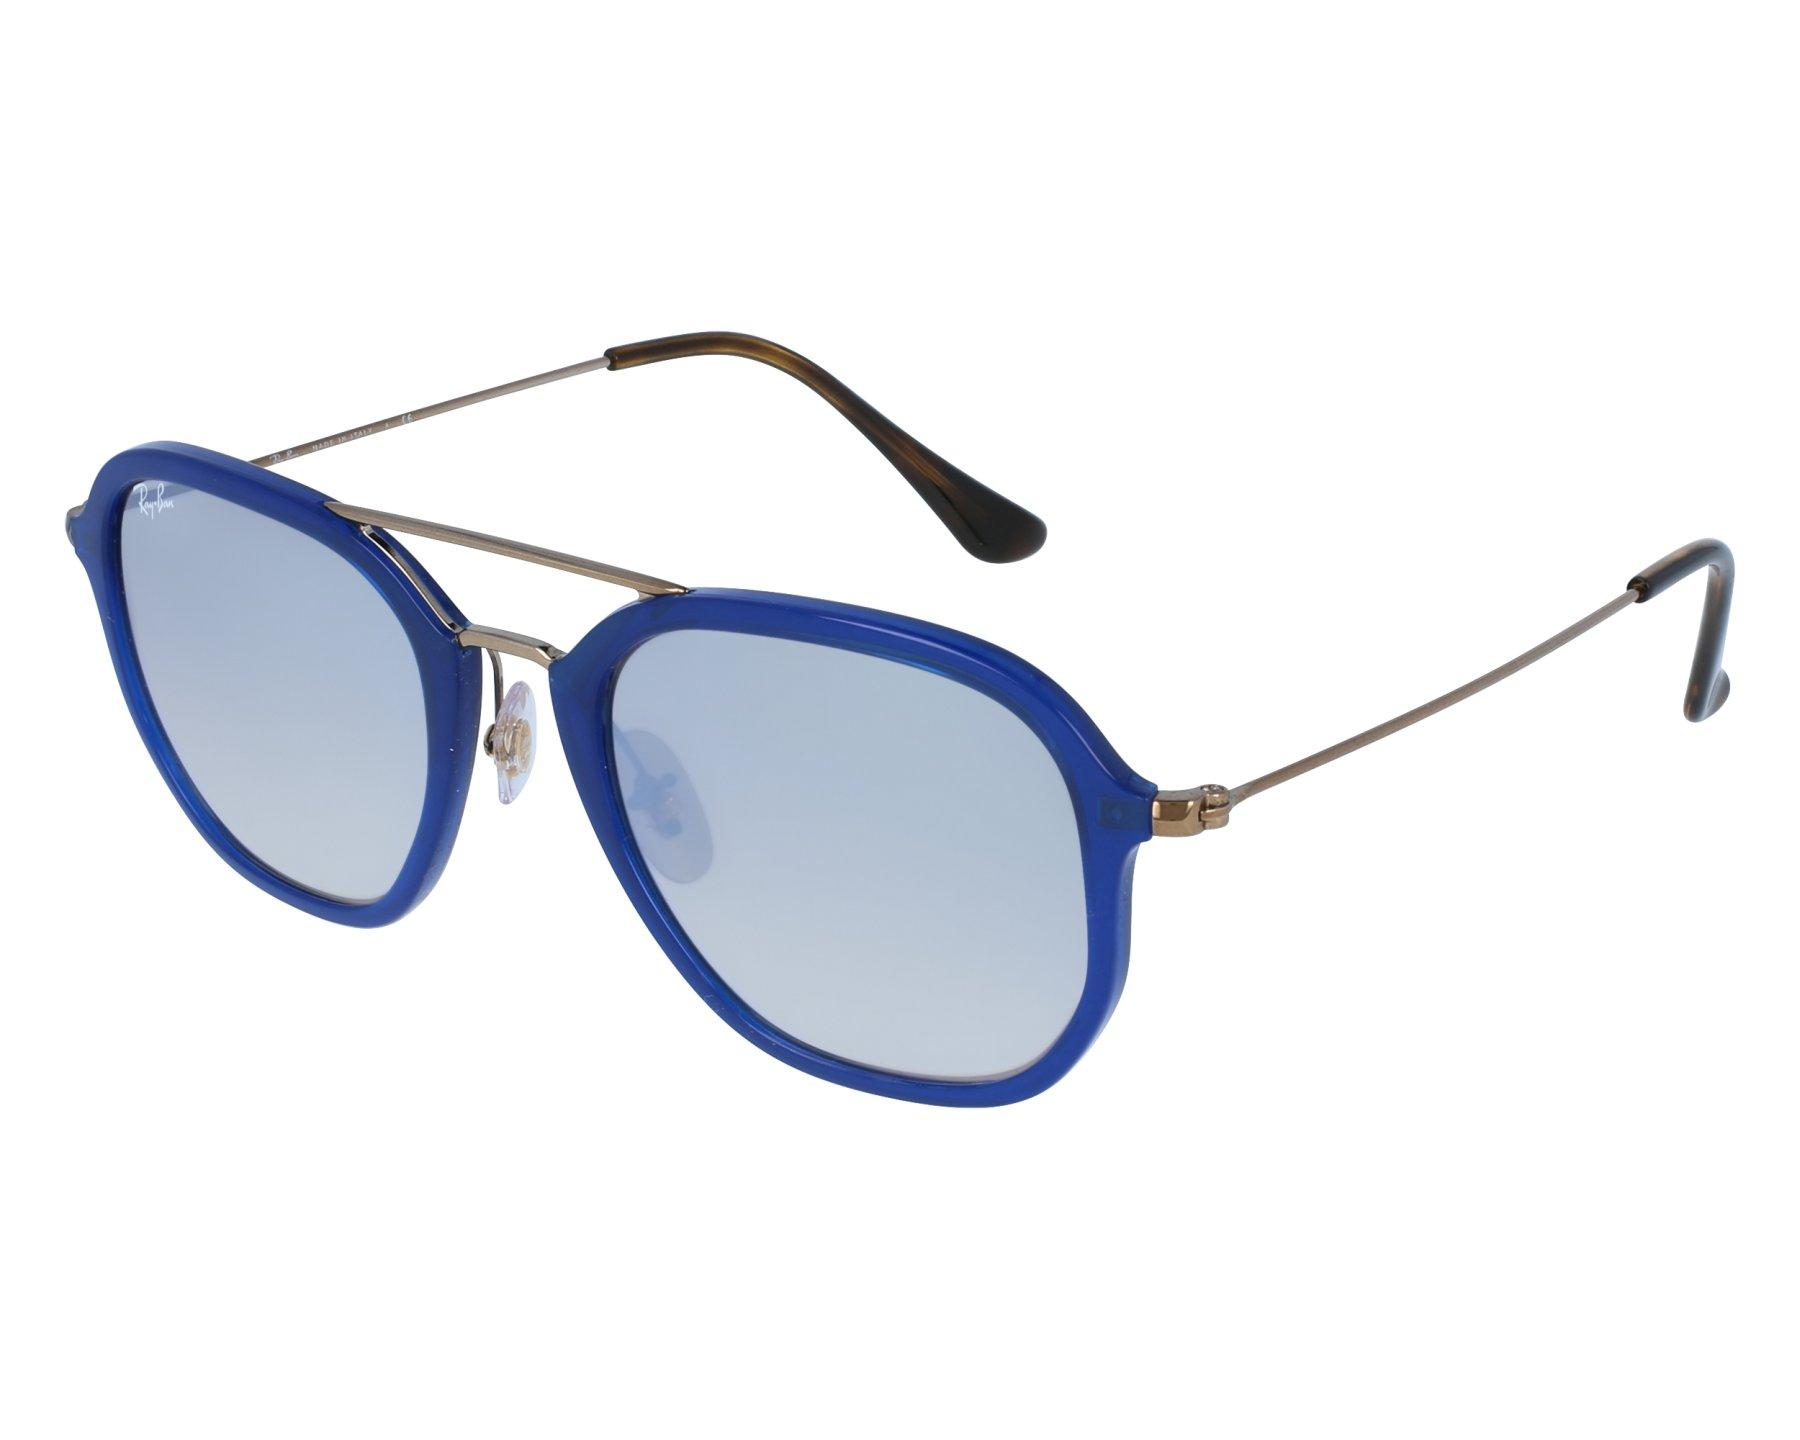 RAY BAN RAY-BAN Sonnenbrille » RB4273«, blau, 62599U - blau/silber